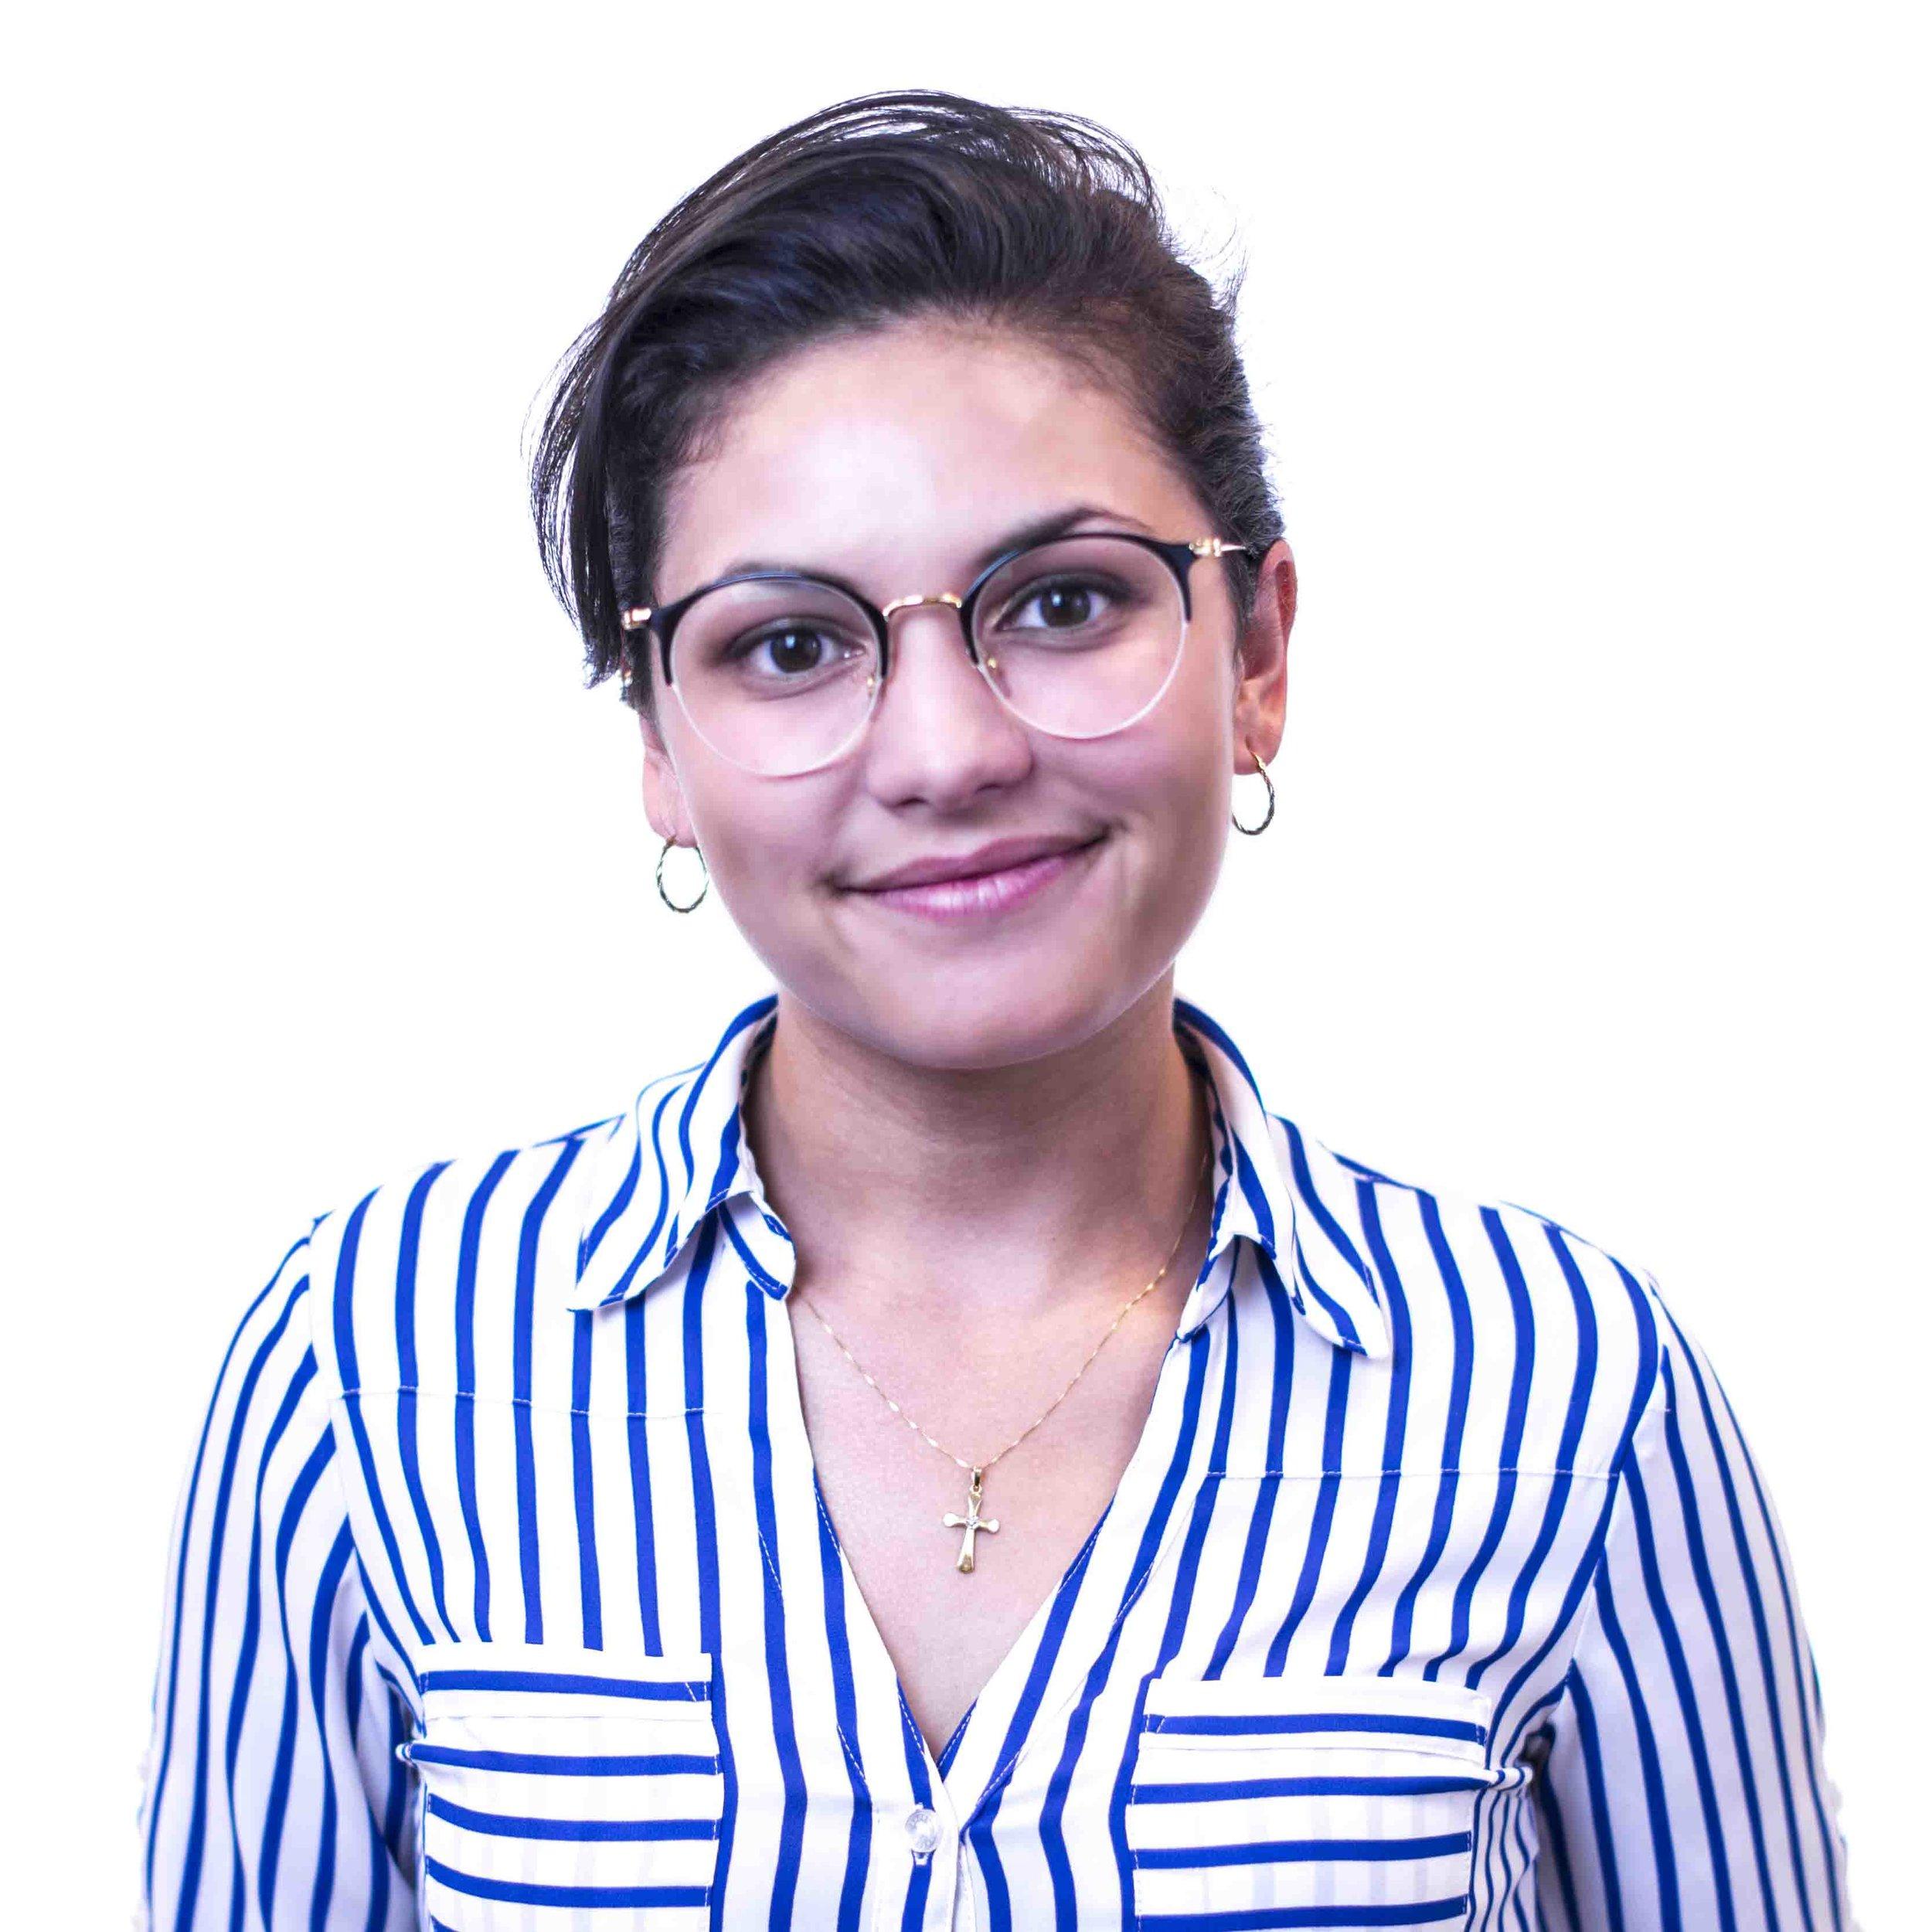 Danielle Dake